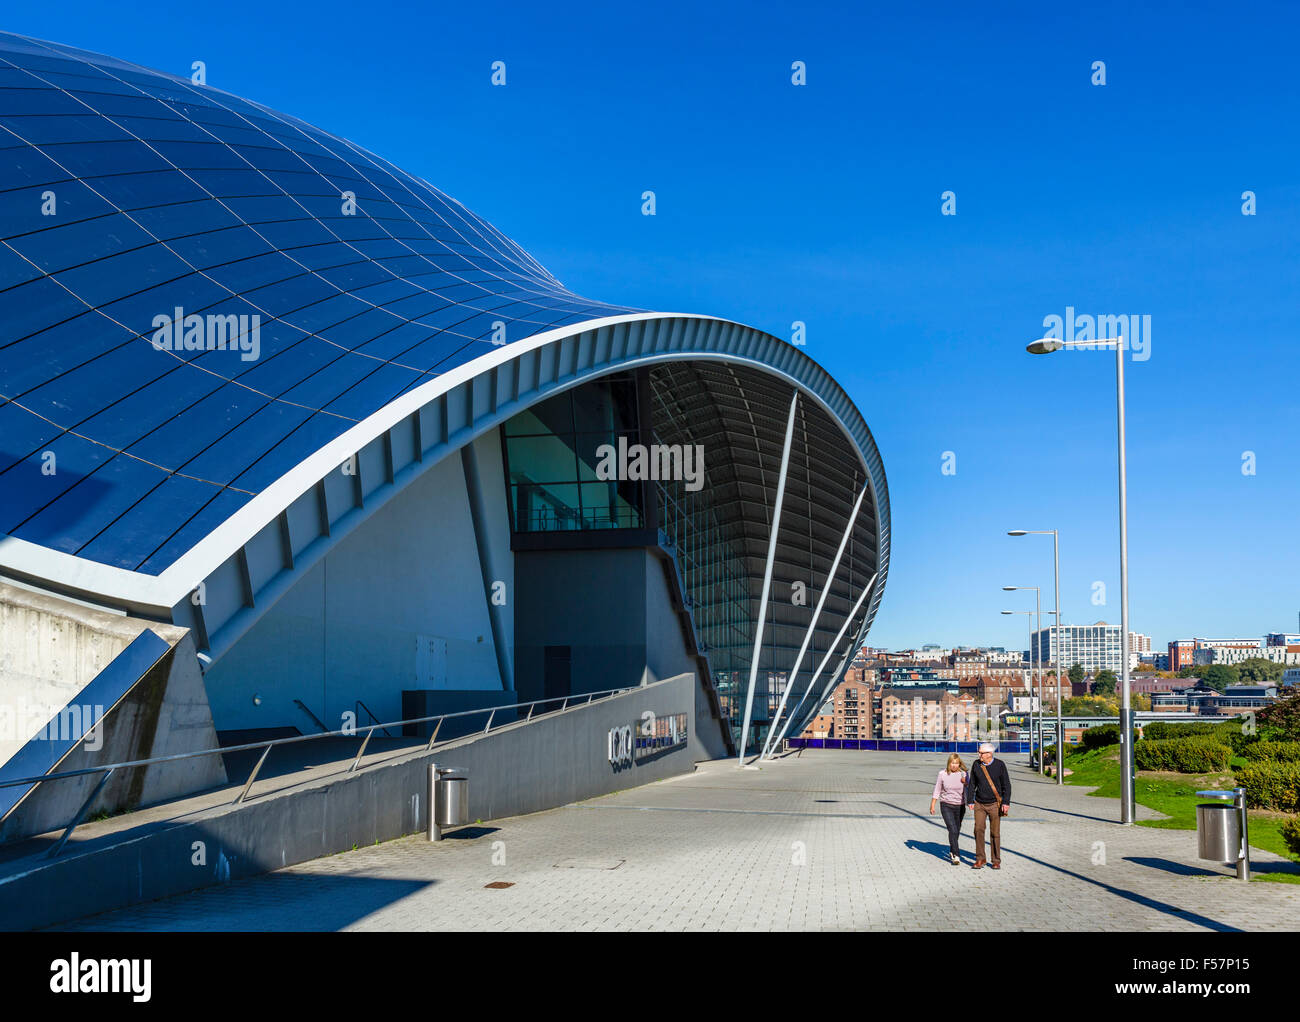 The entrance to the Sage Gateshead, Newcastle, Tyne and Wear, UK - Stock Image